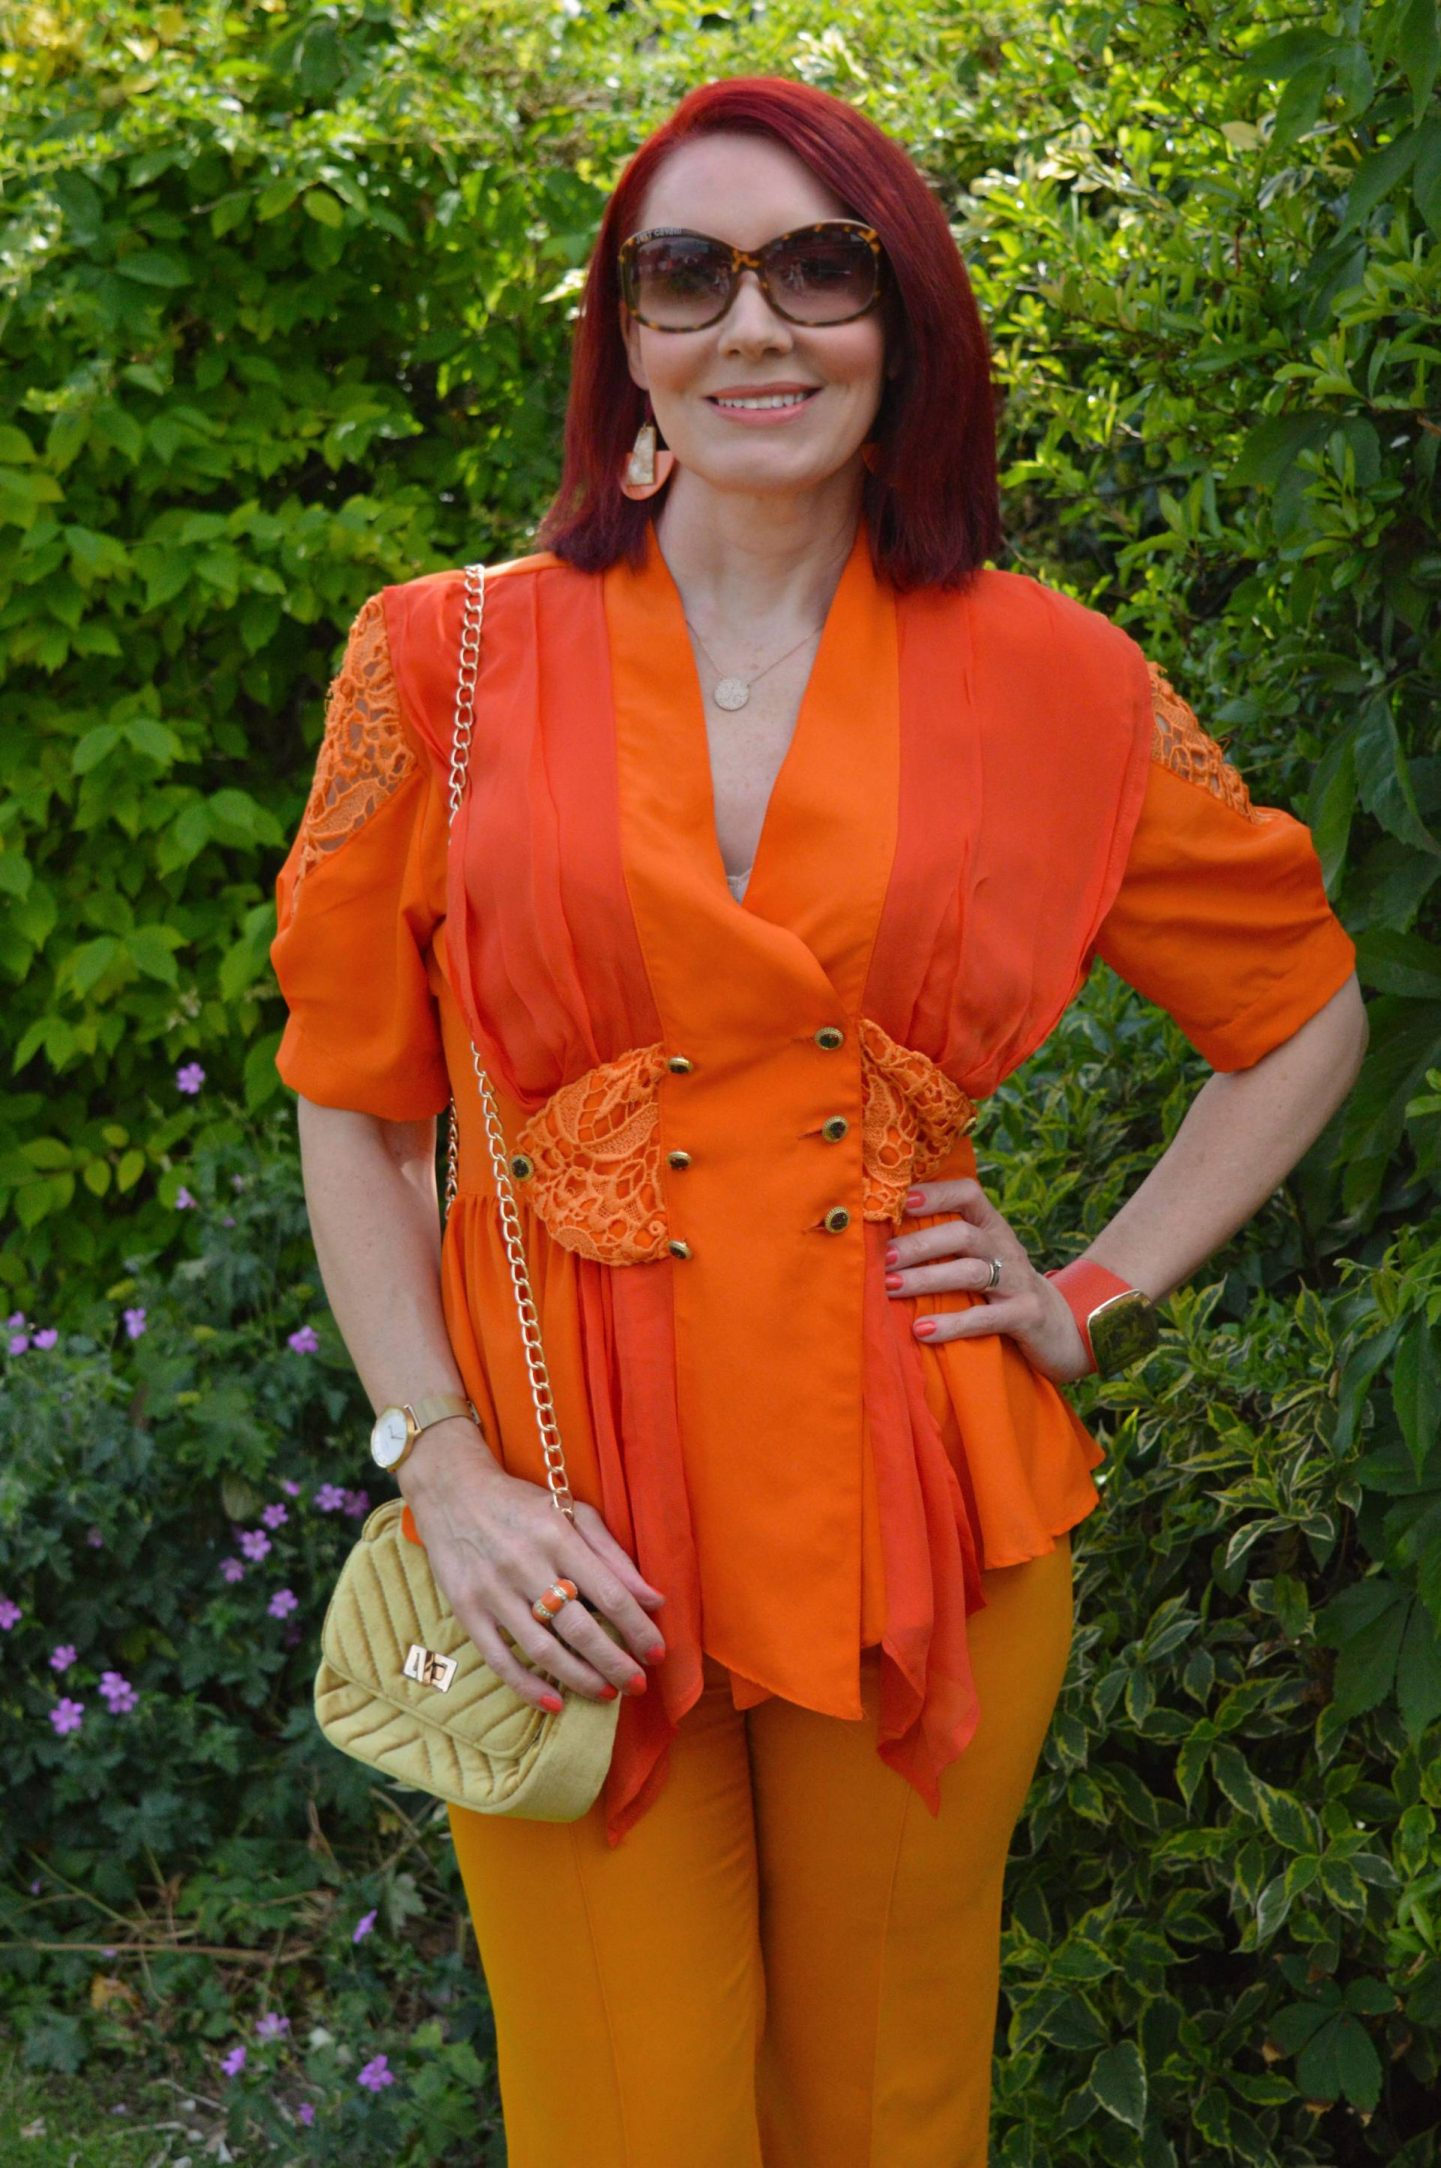 Orange Crush, vintage orange blouse, Zara marigold orange trousers, Miss Sixty orange sandals